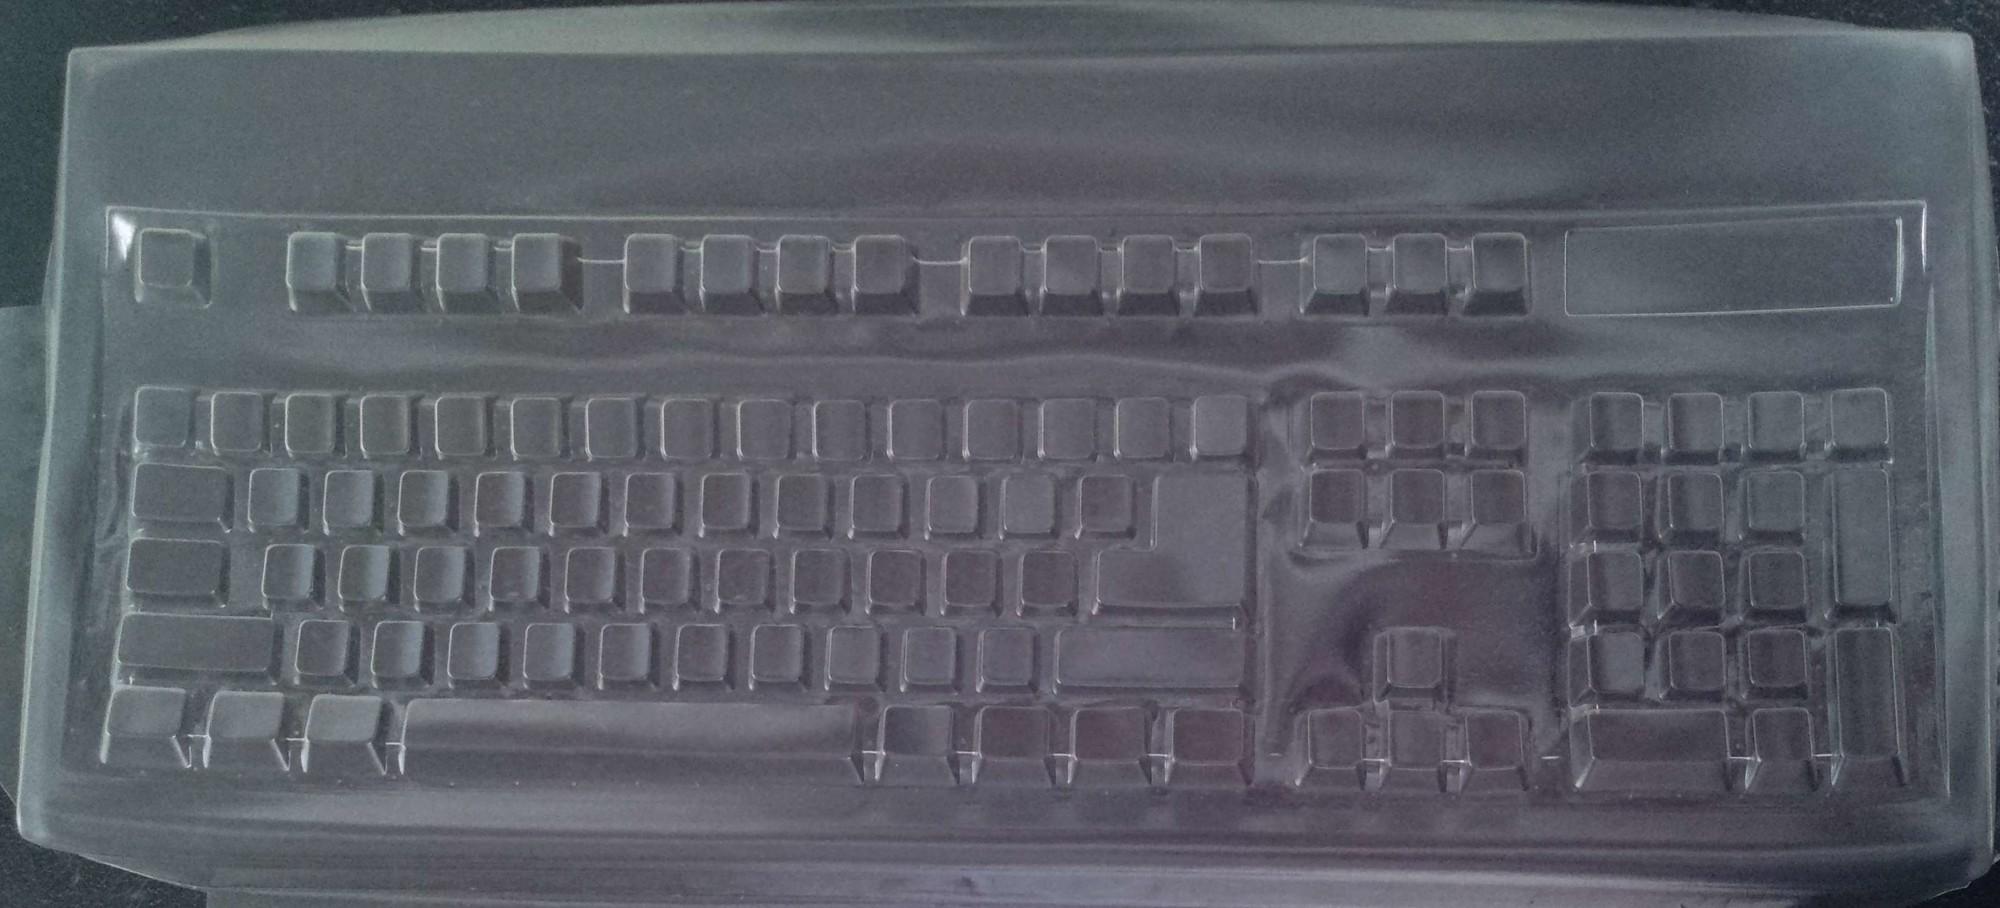 Key Tronic 3601QLC Win Keyboard Cover